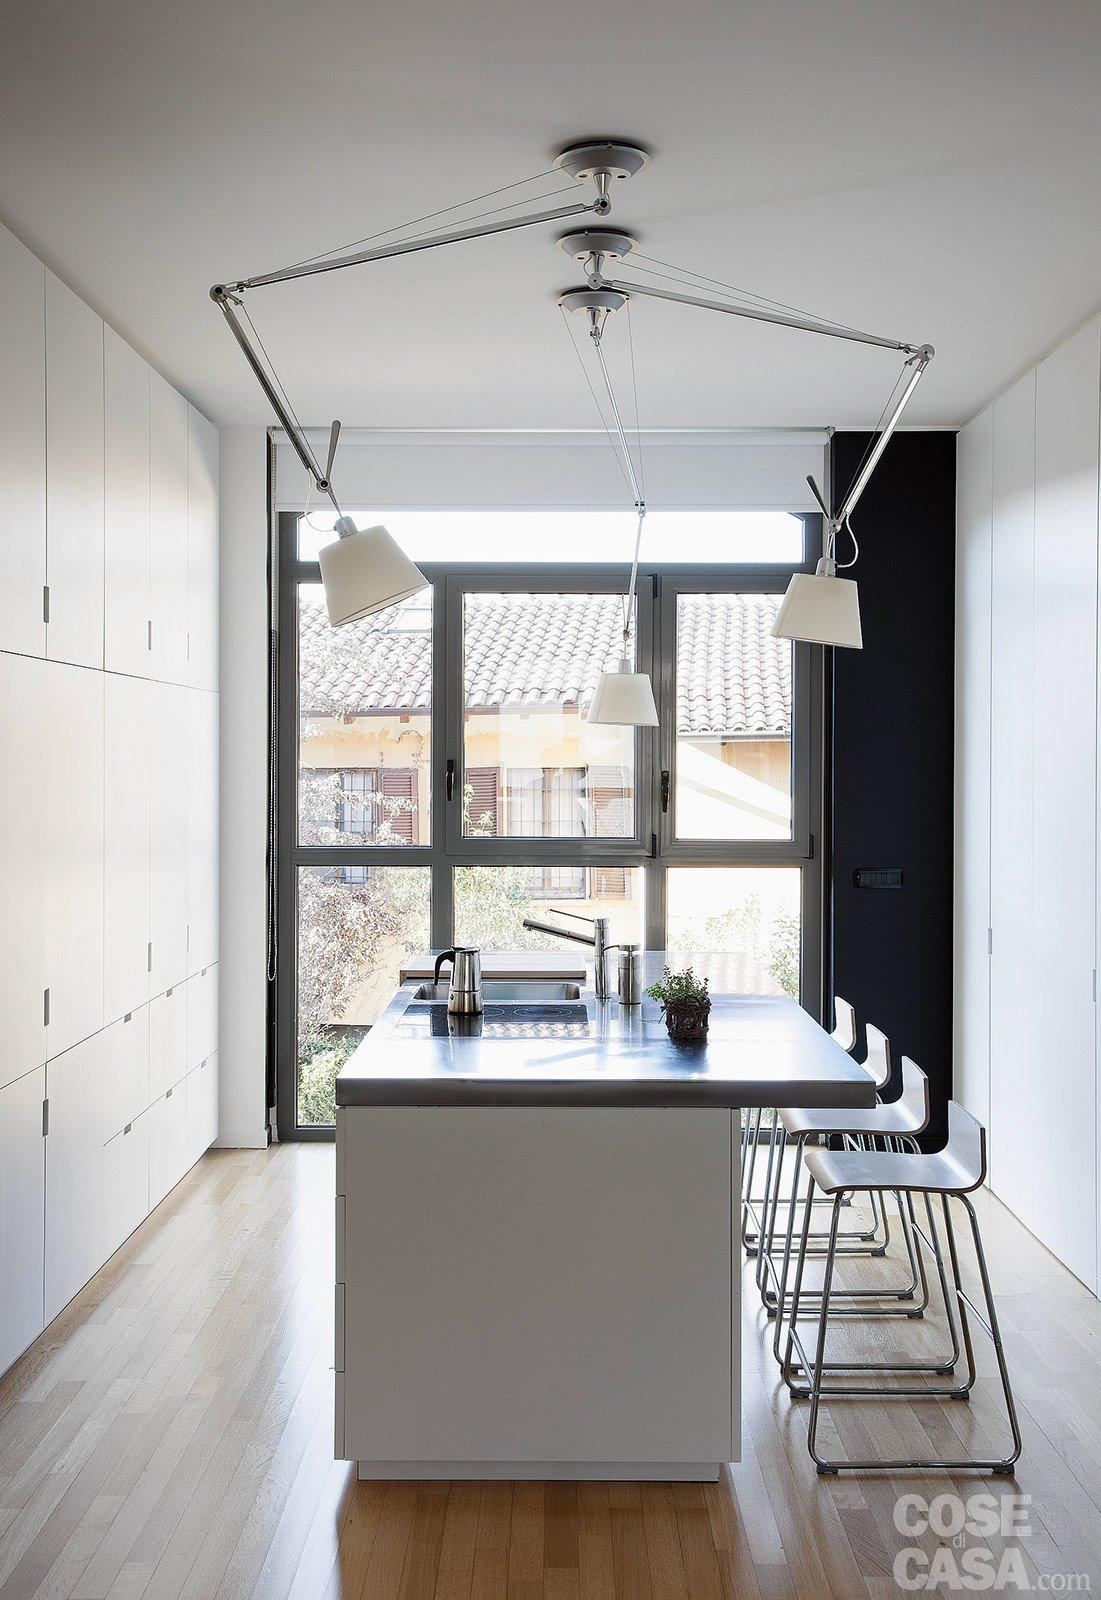 Stunning Ikea Cucine 2014 Images - Ideas & Design 2017 ...